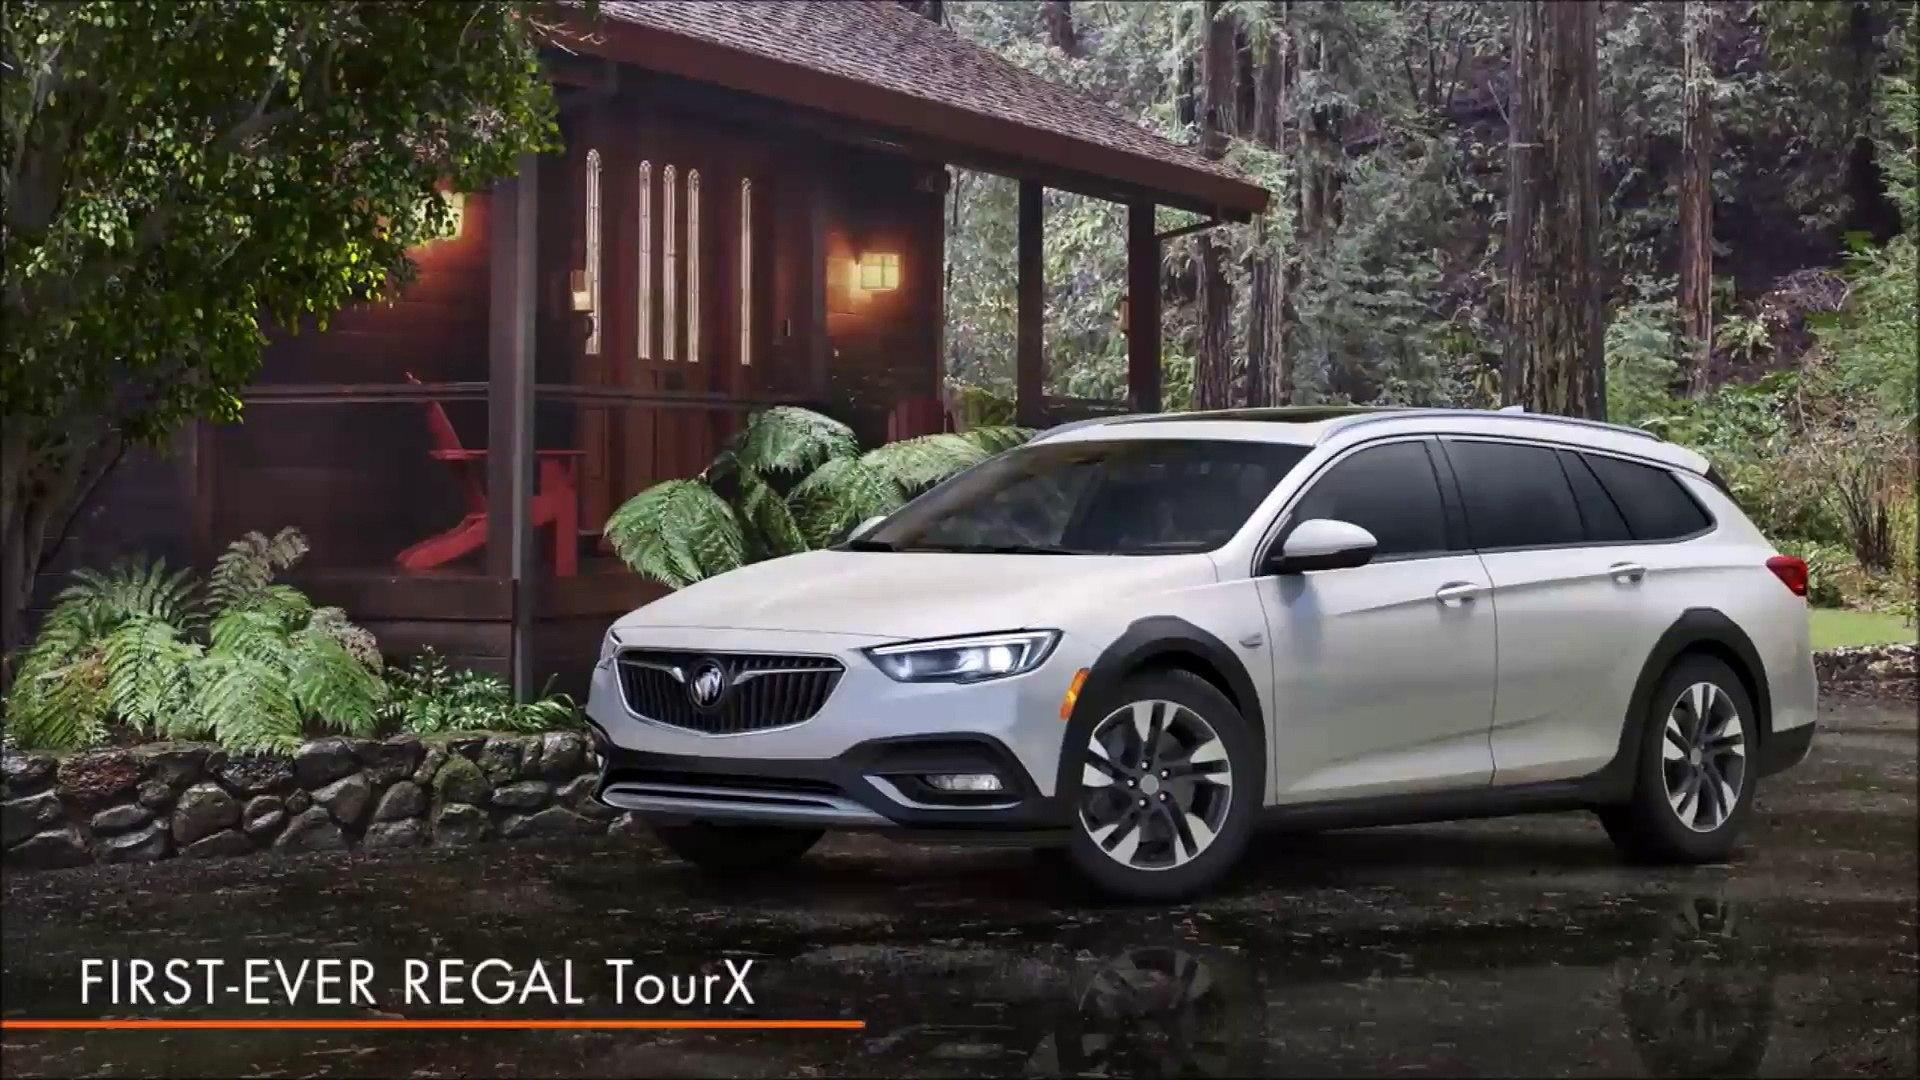 2018 Buick Enclave Front Royal, VA | Buick Enclave Front Royal, VA